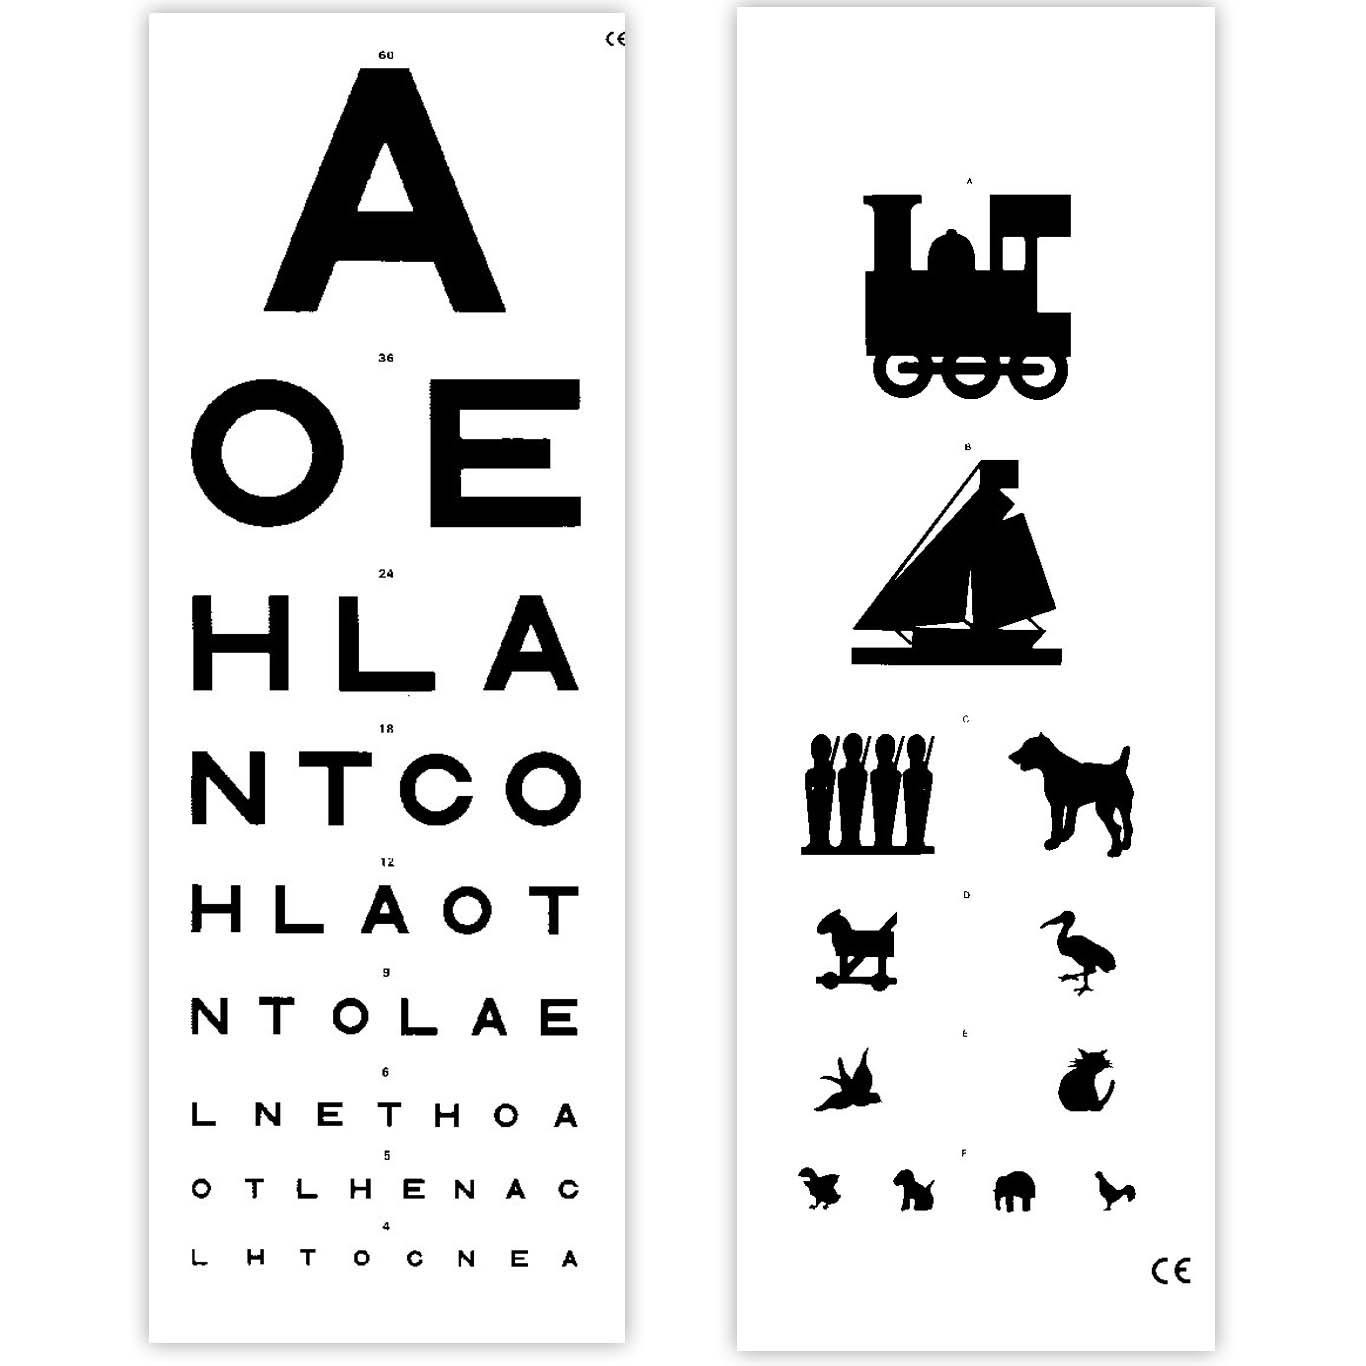 a72c677d5585 Eye Test Chart 6 Metre Distance    Sports Supports